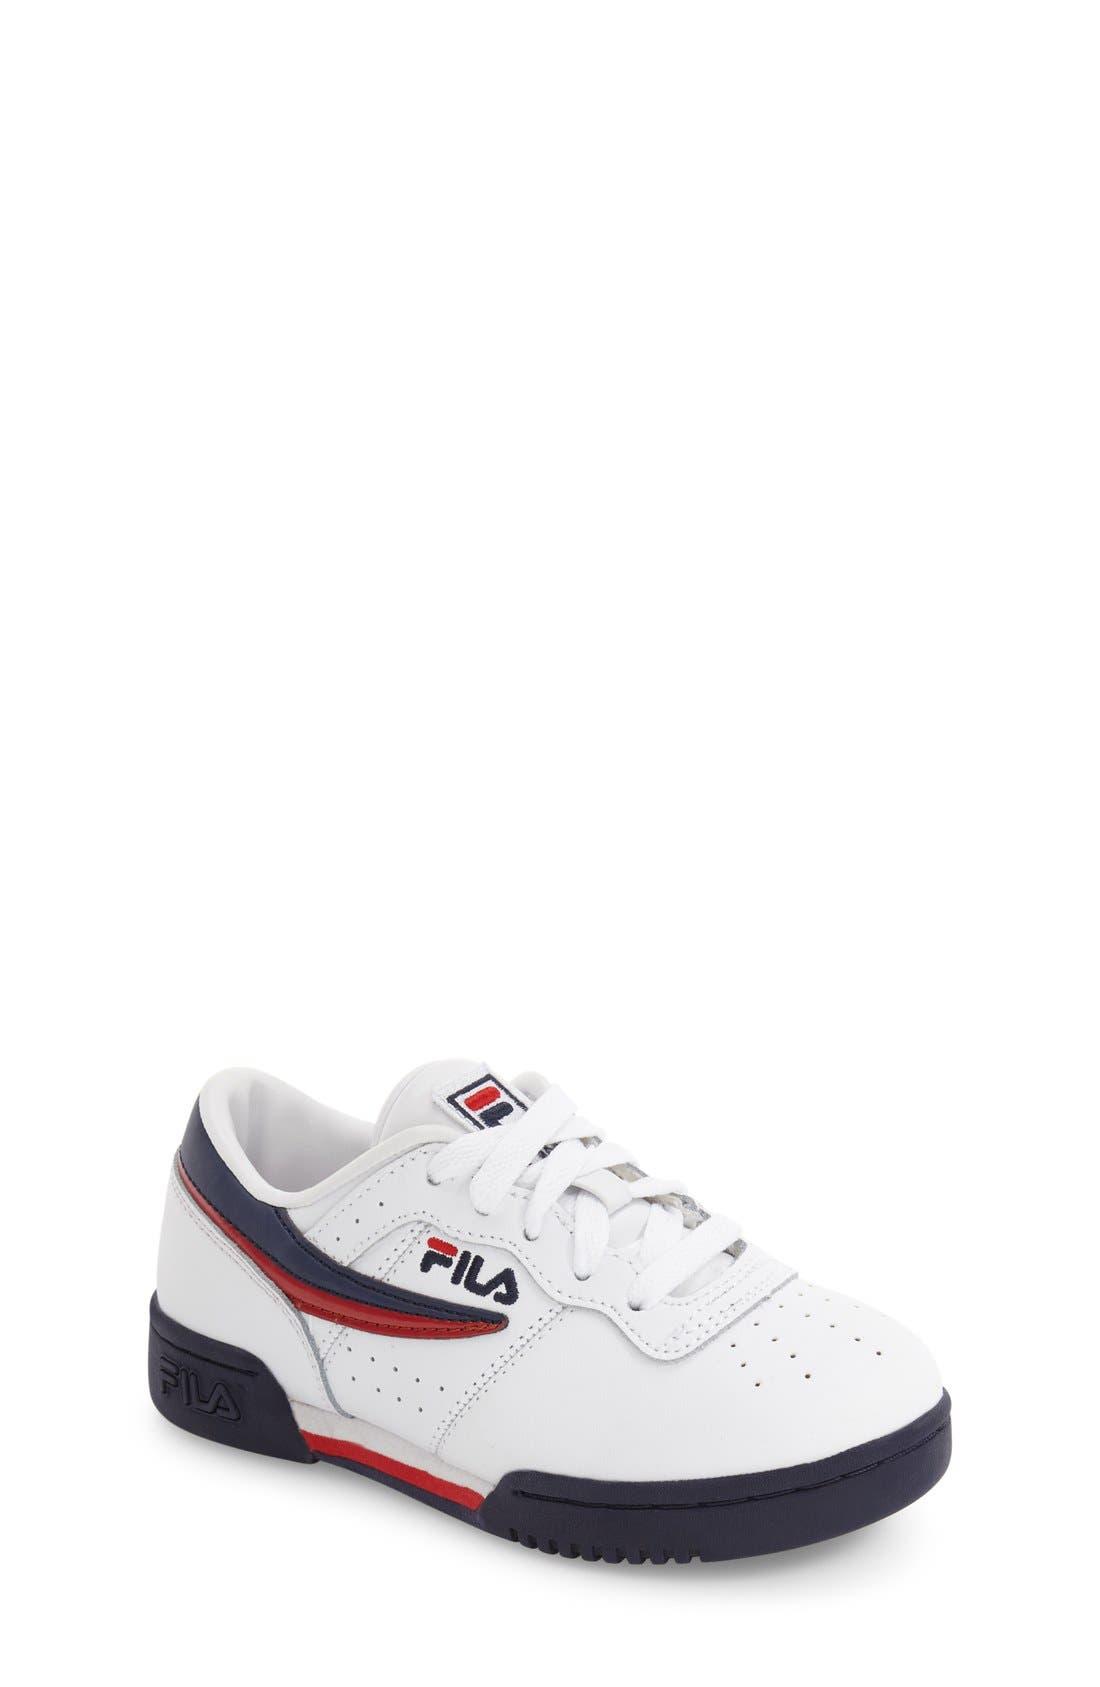 FILA Original Sneaker (Toddler, Little Kid & Big Kid)